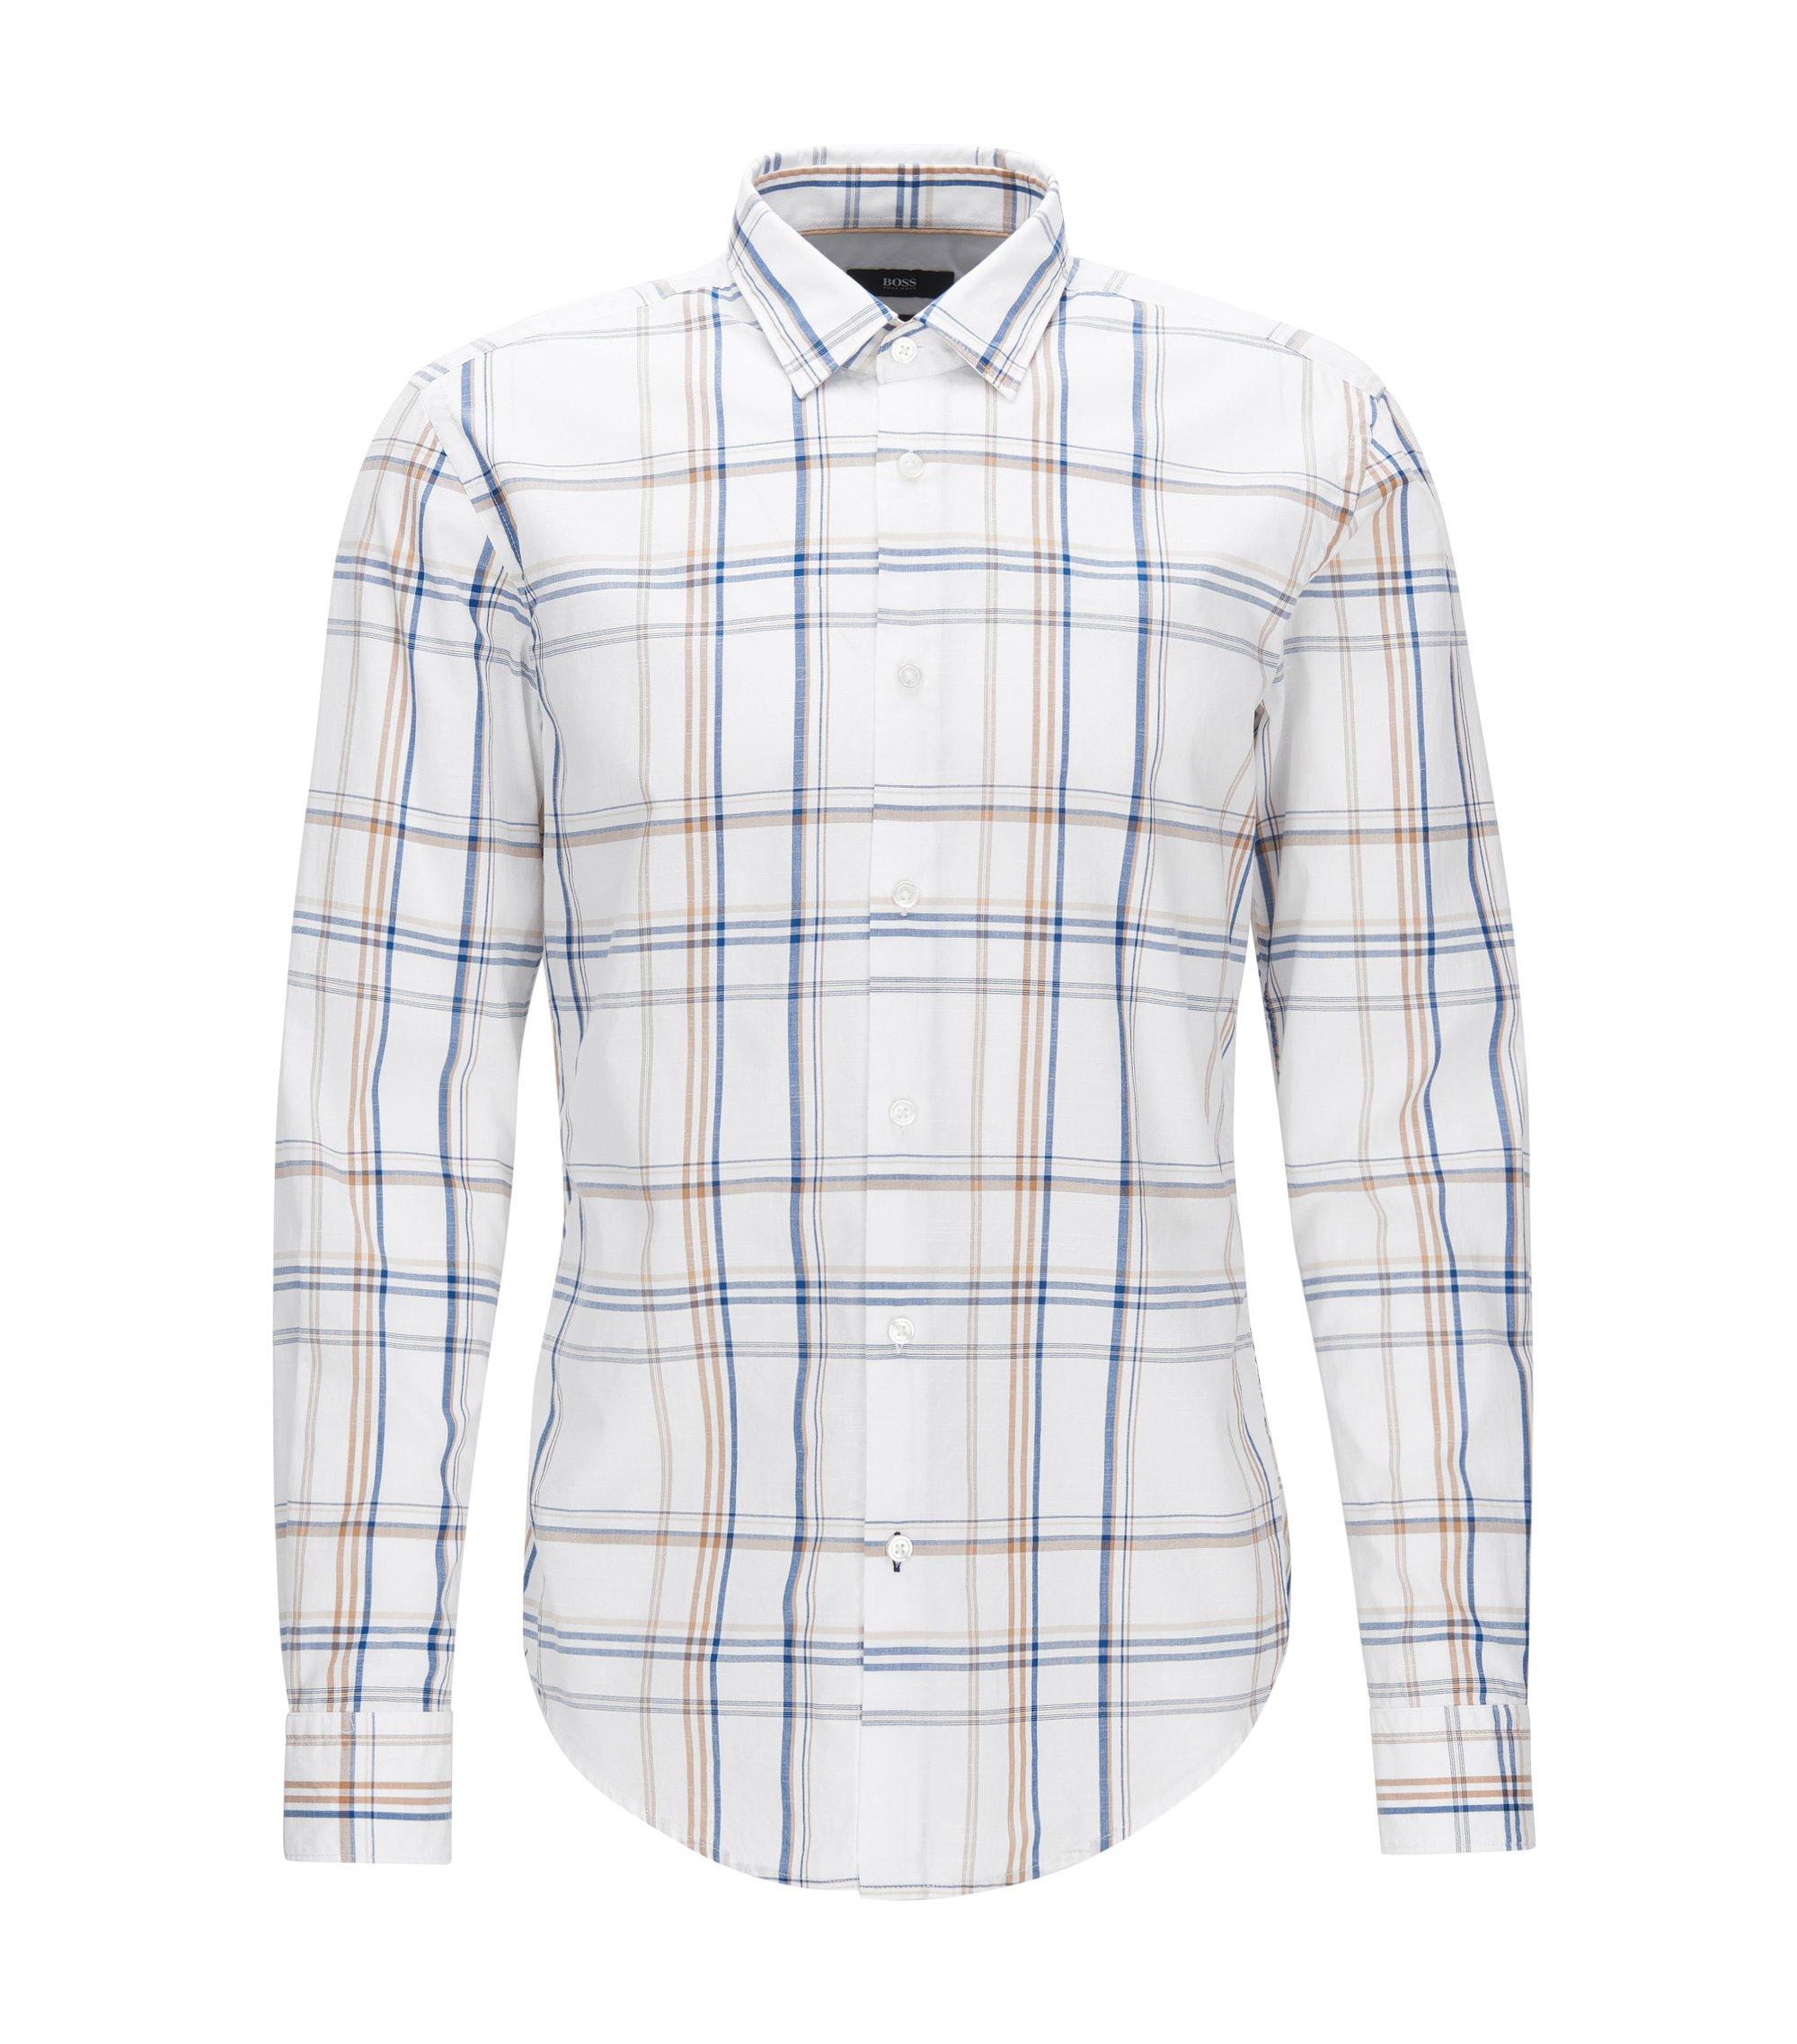 Plaid Cotton Button Down Shirt, Slim Fit | Ronni, White